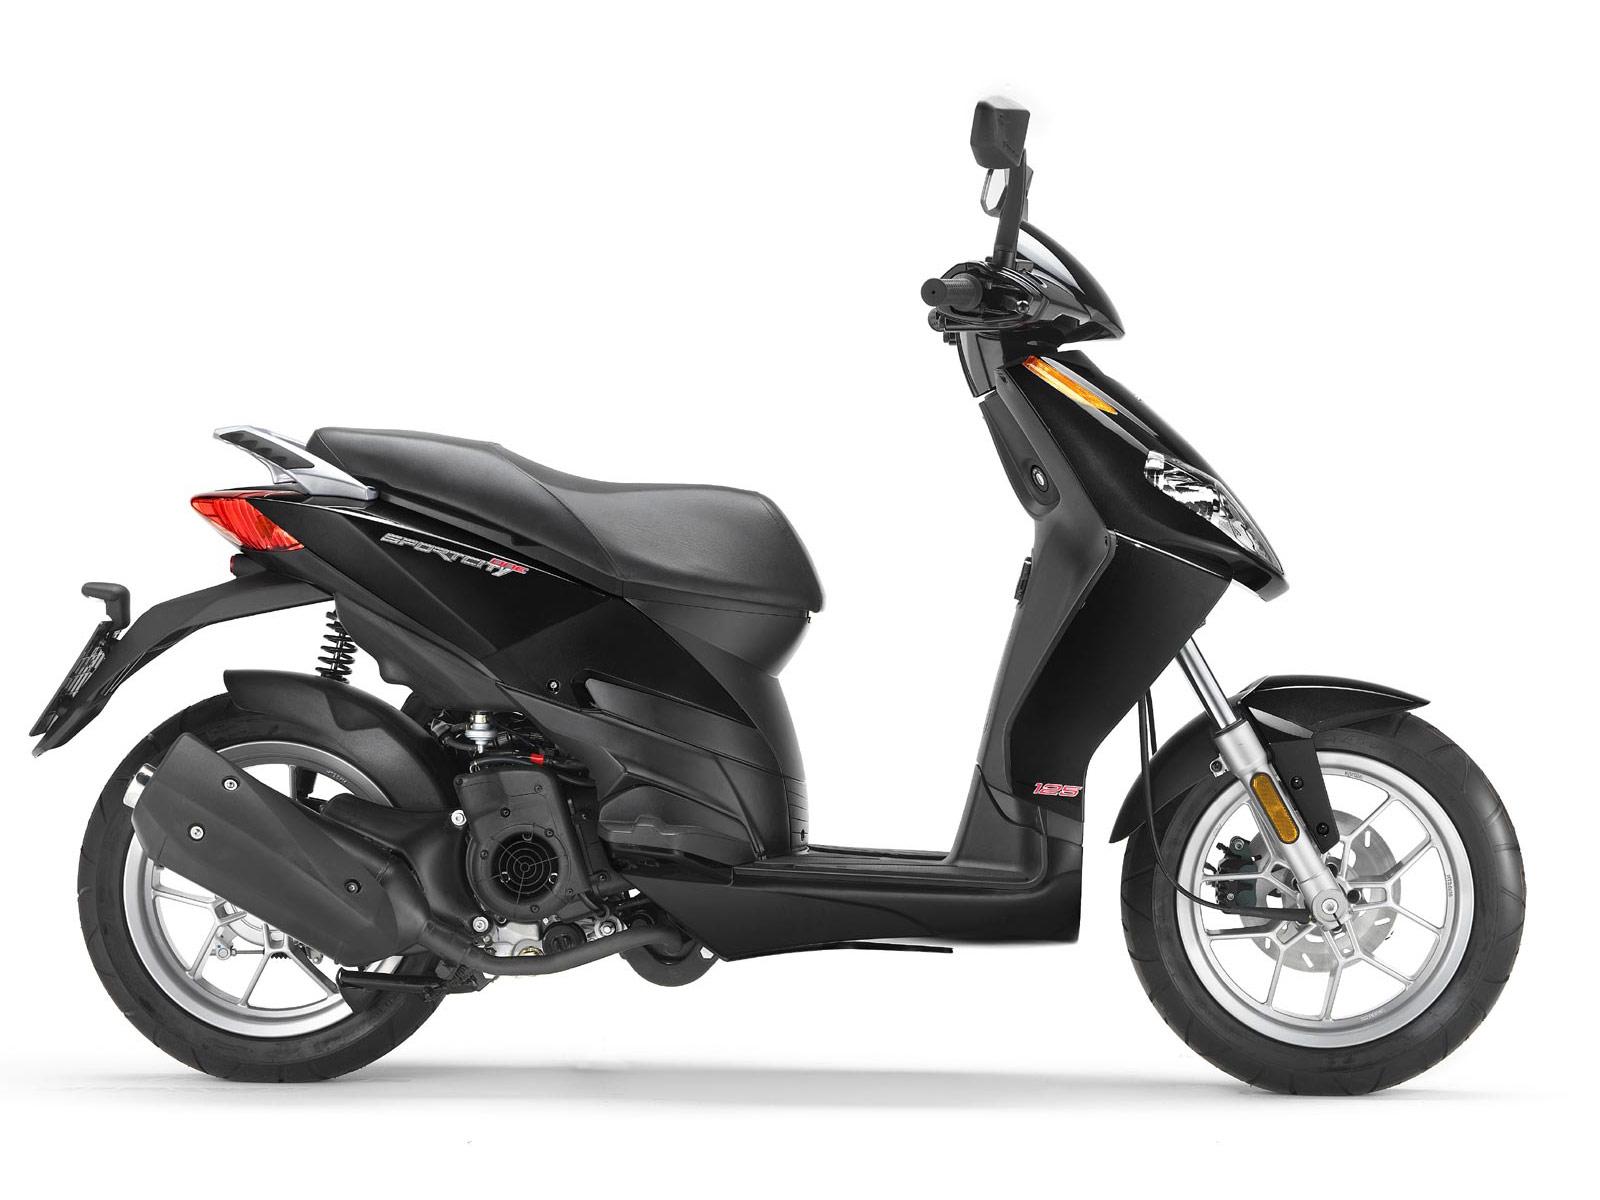 2009 aprilia sportcity one 125 scooter insurance. Black Bedroom Furniture Sets. Home Design Ideas